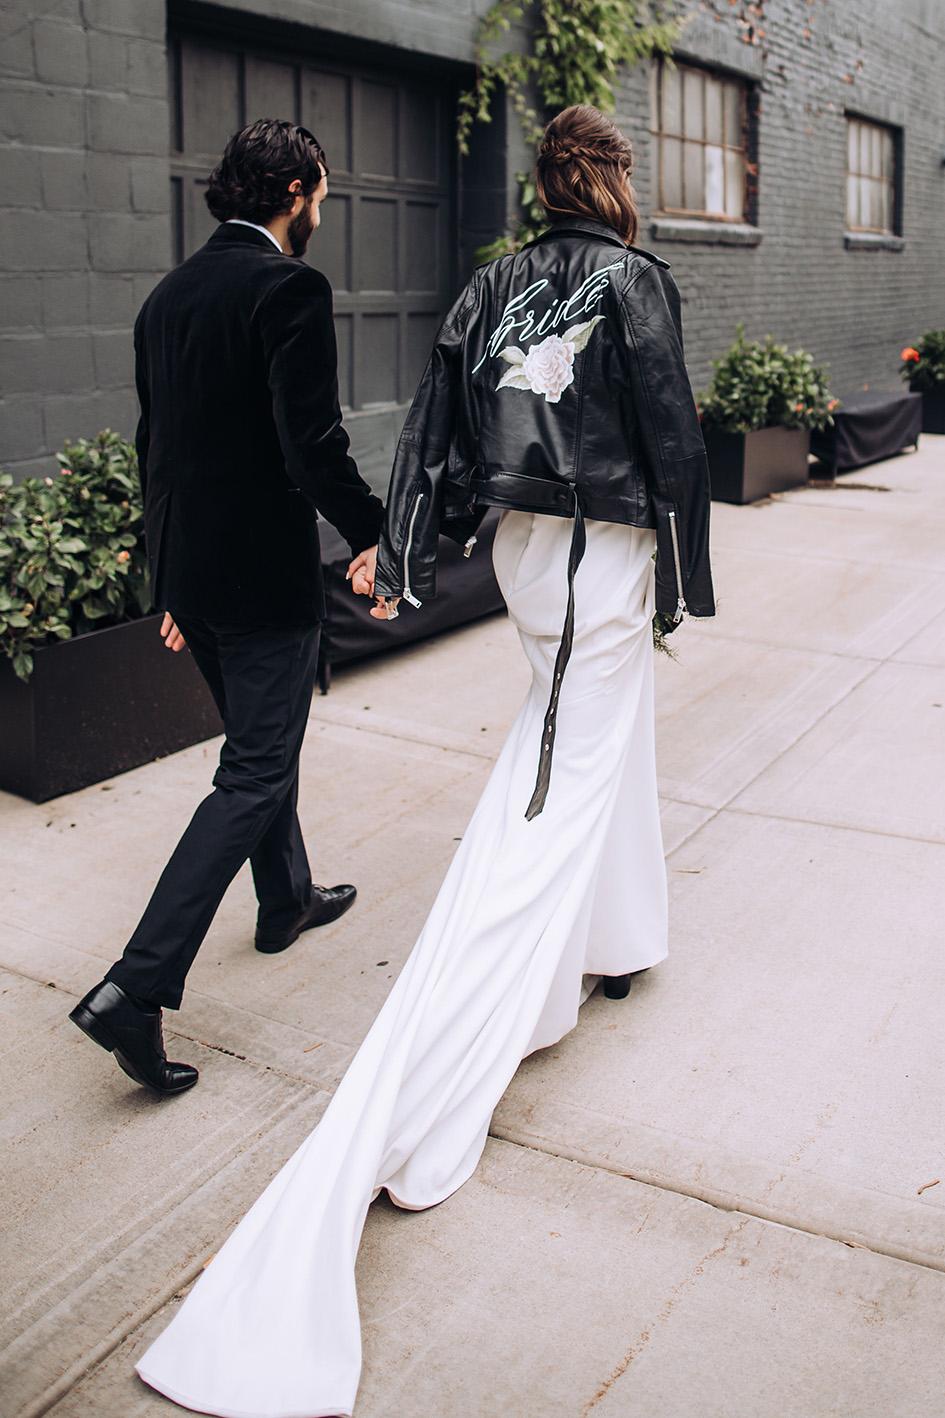 personalized calligraphy wedding jackets